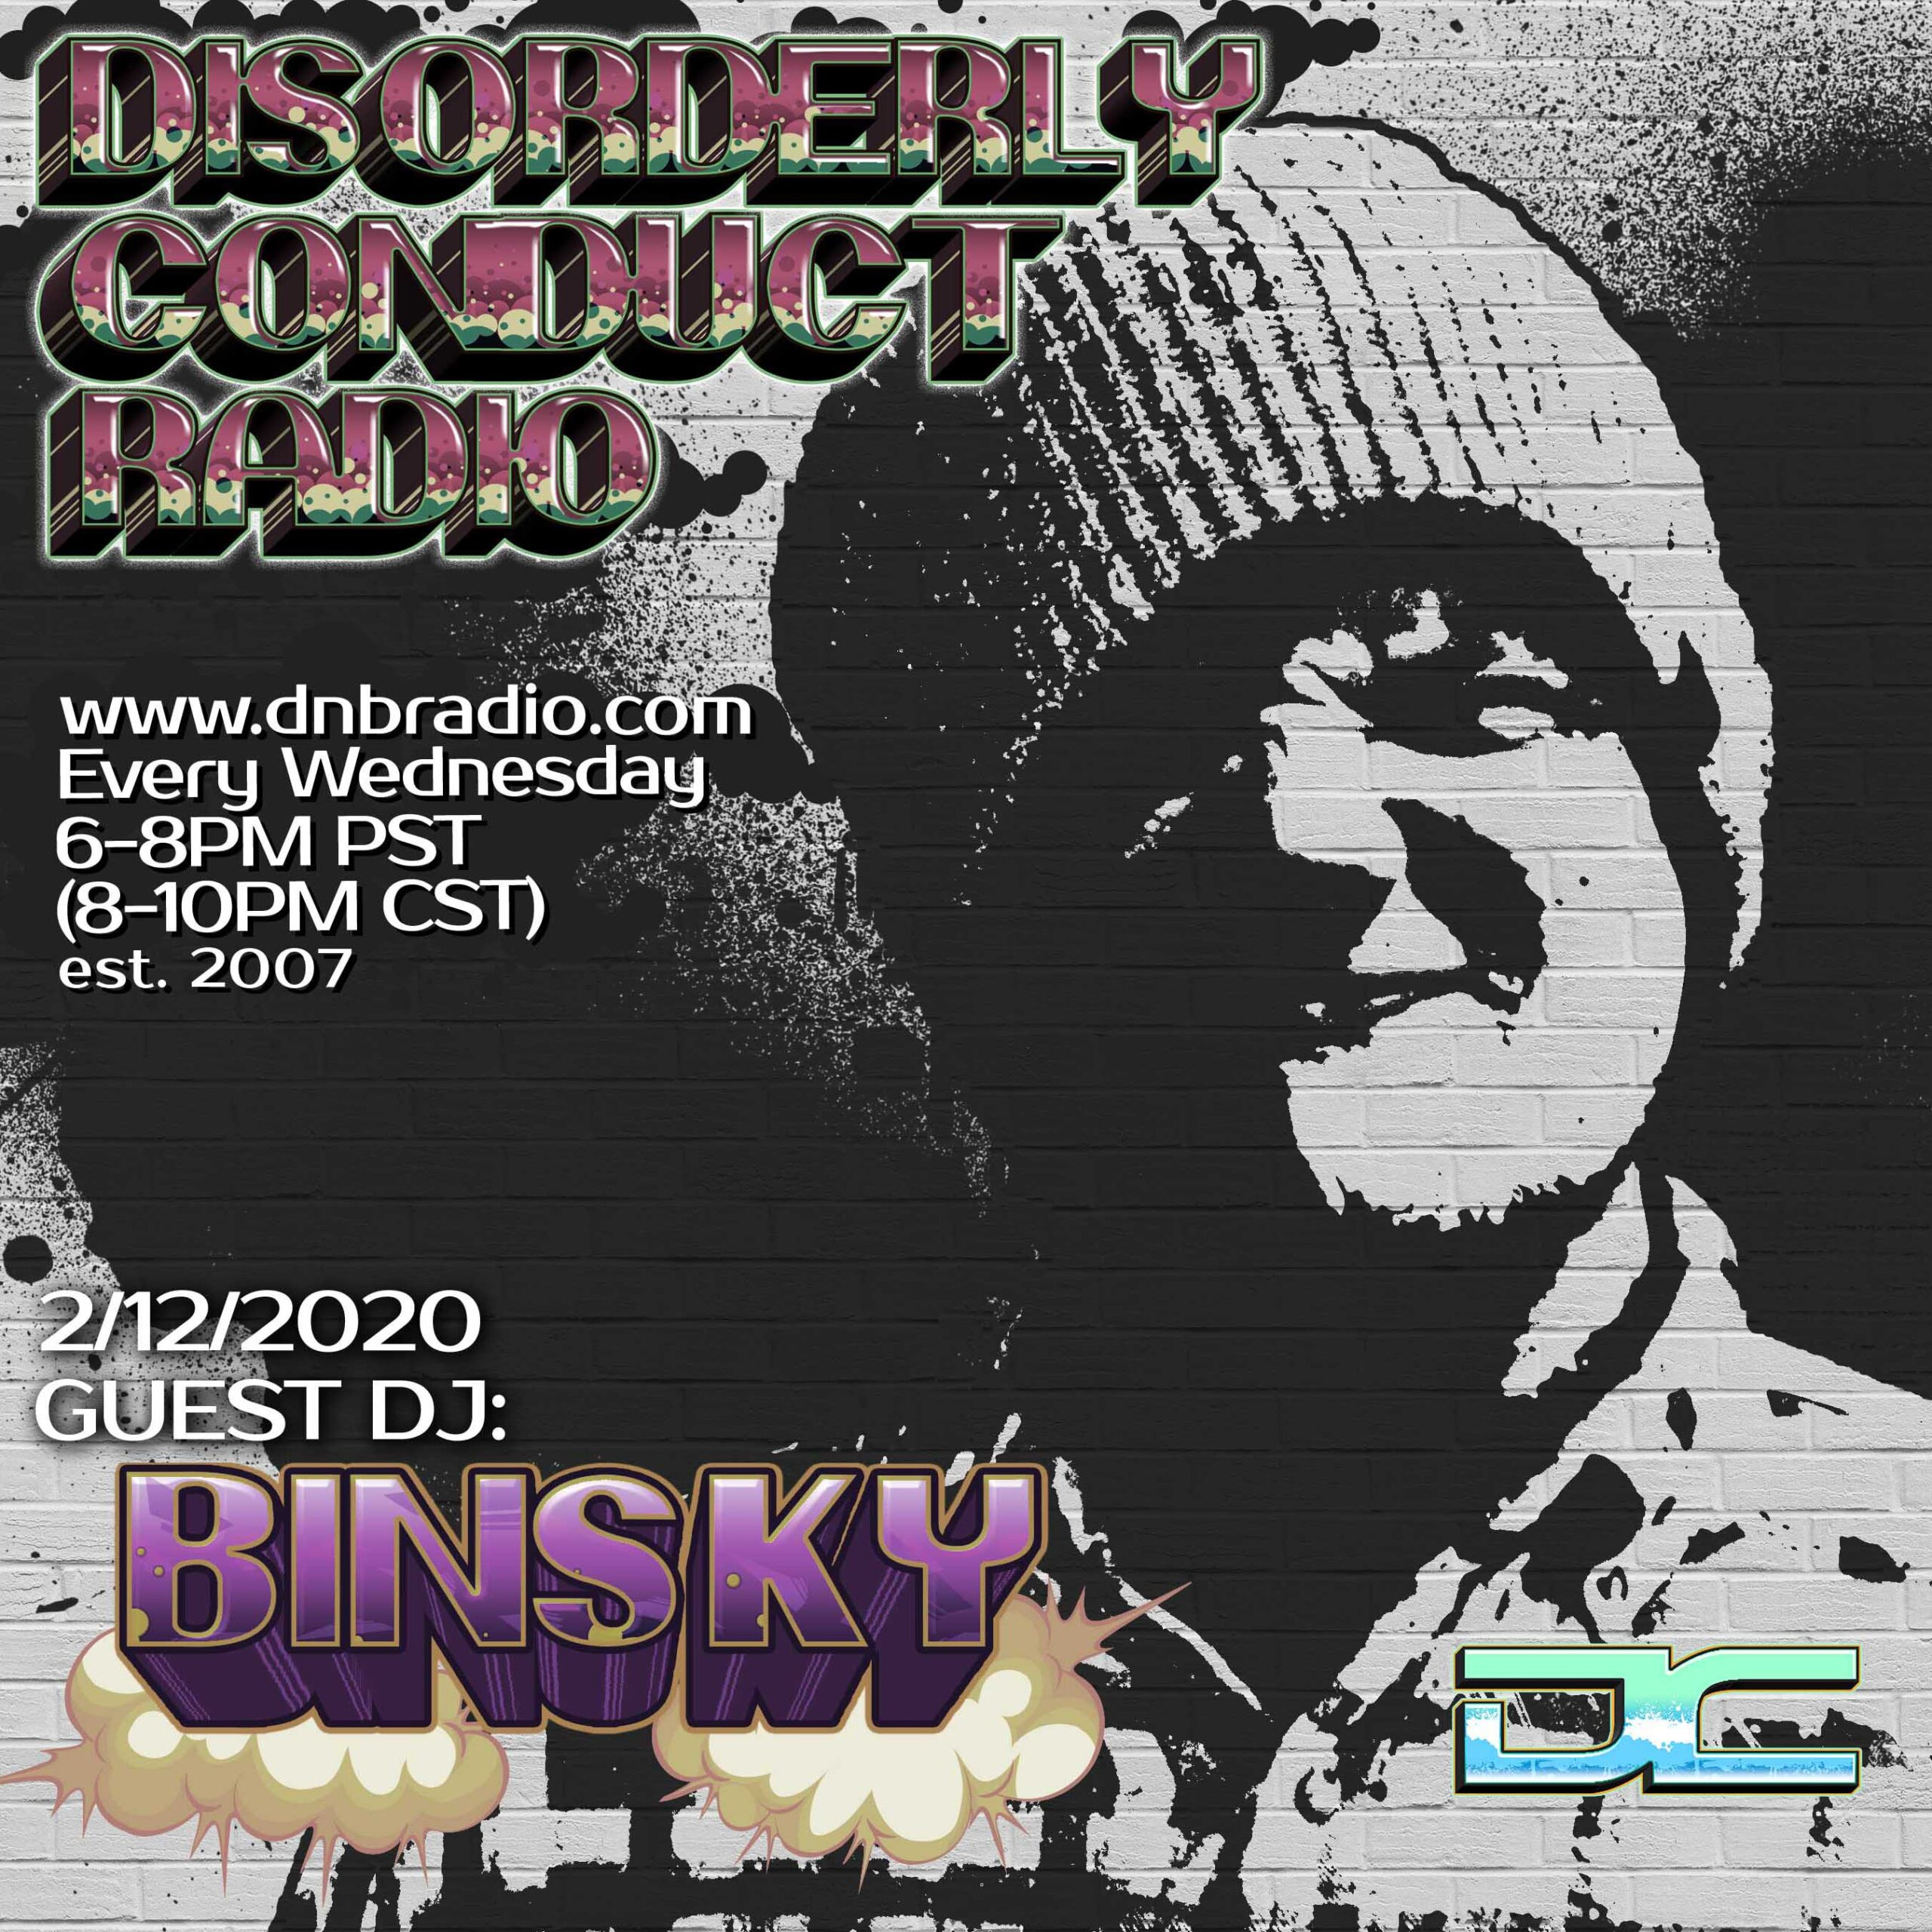 Mr. Solve and Binsky – Disorderly Conduct Radio 021220